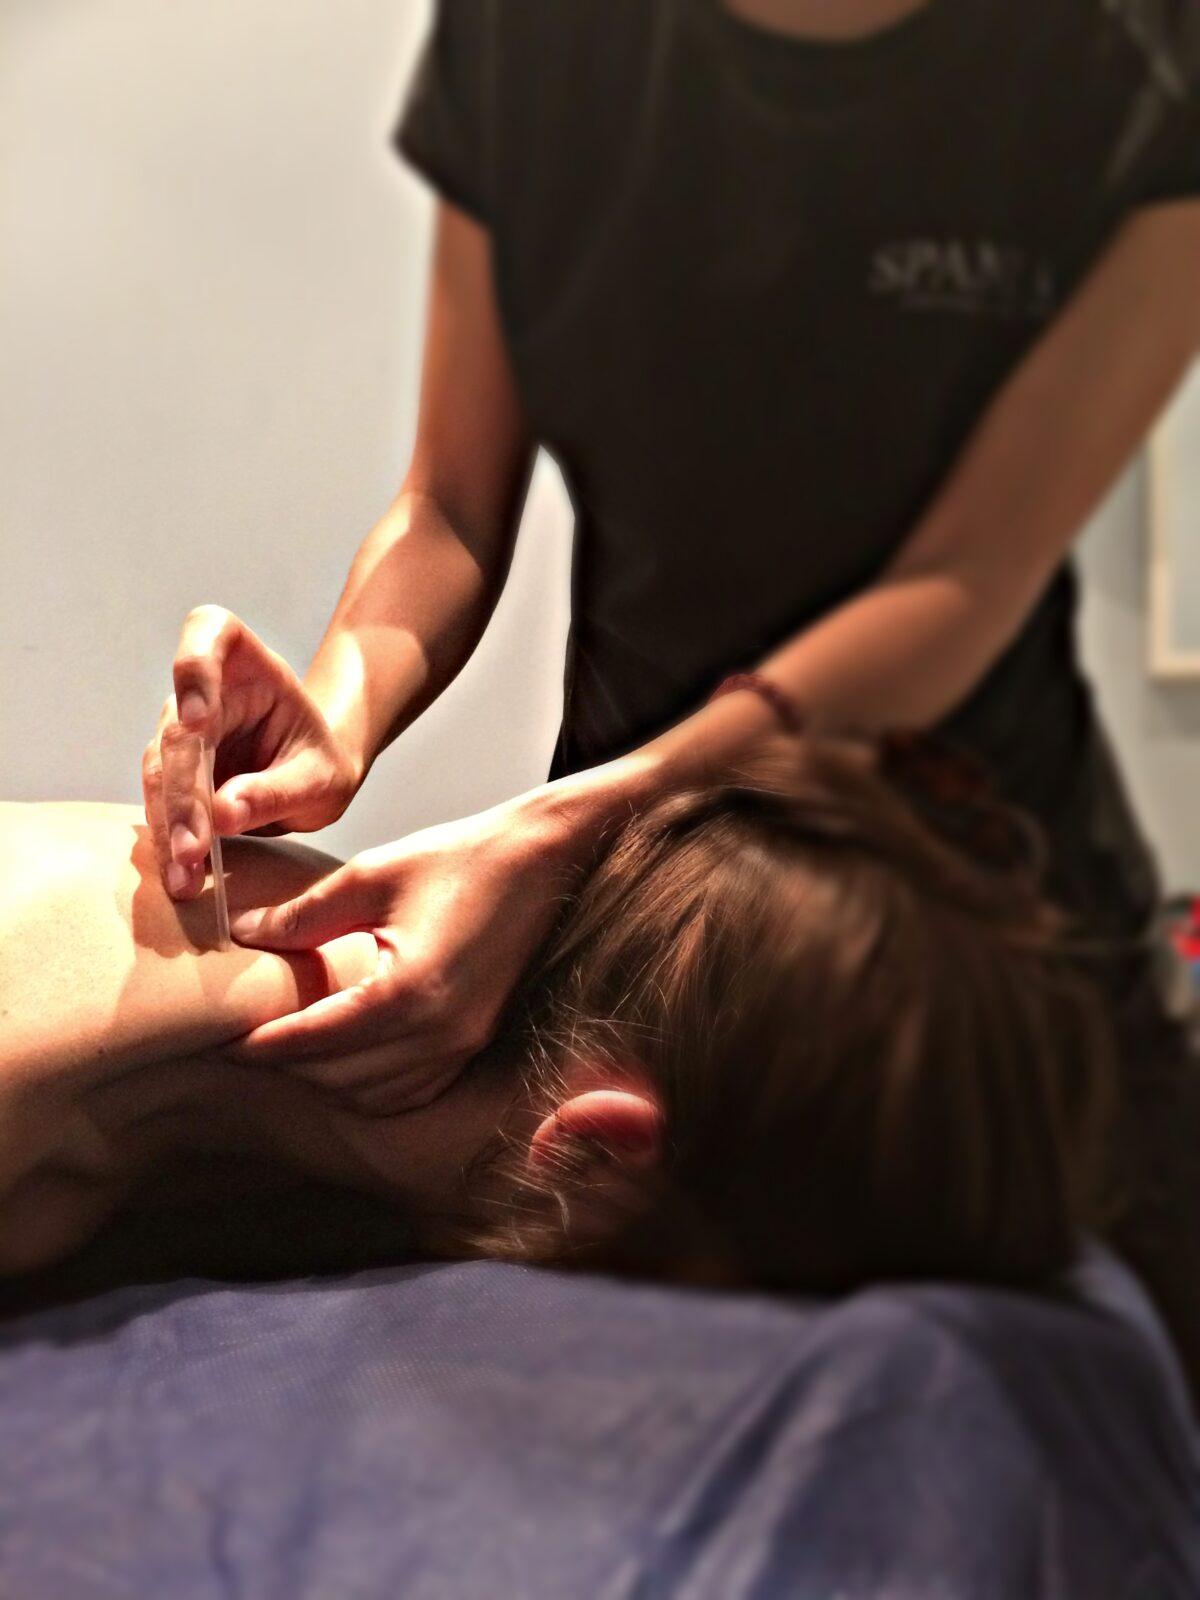 Spania Fisioterapia - Fisioterapia